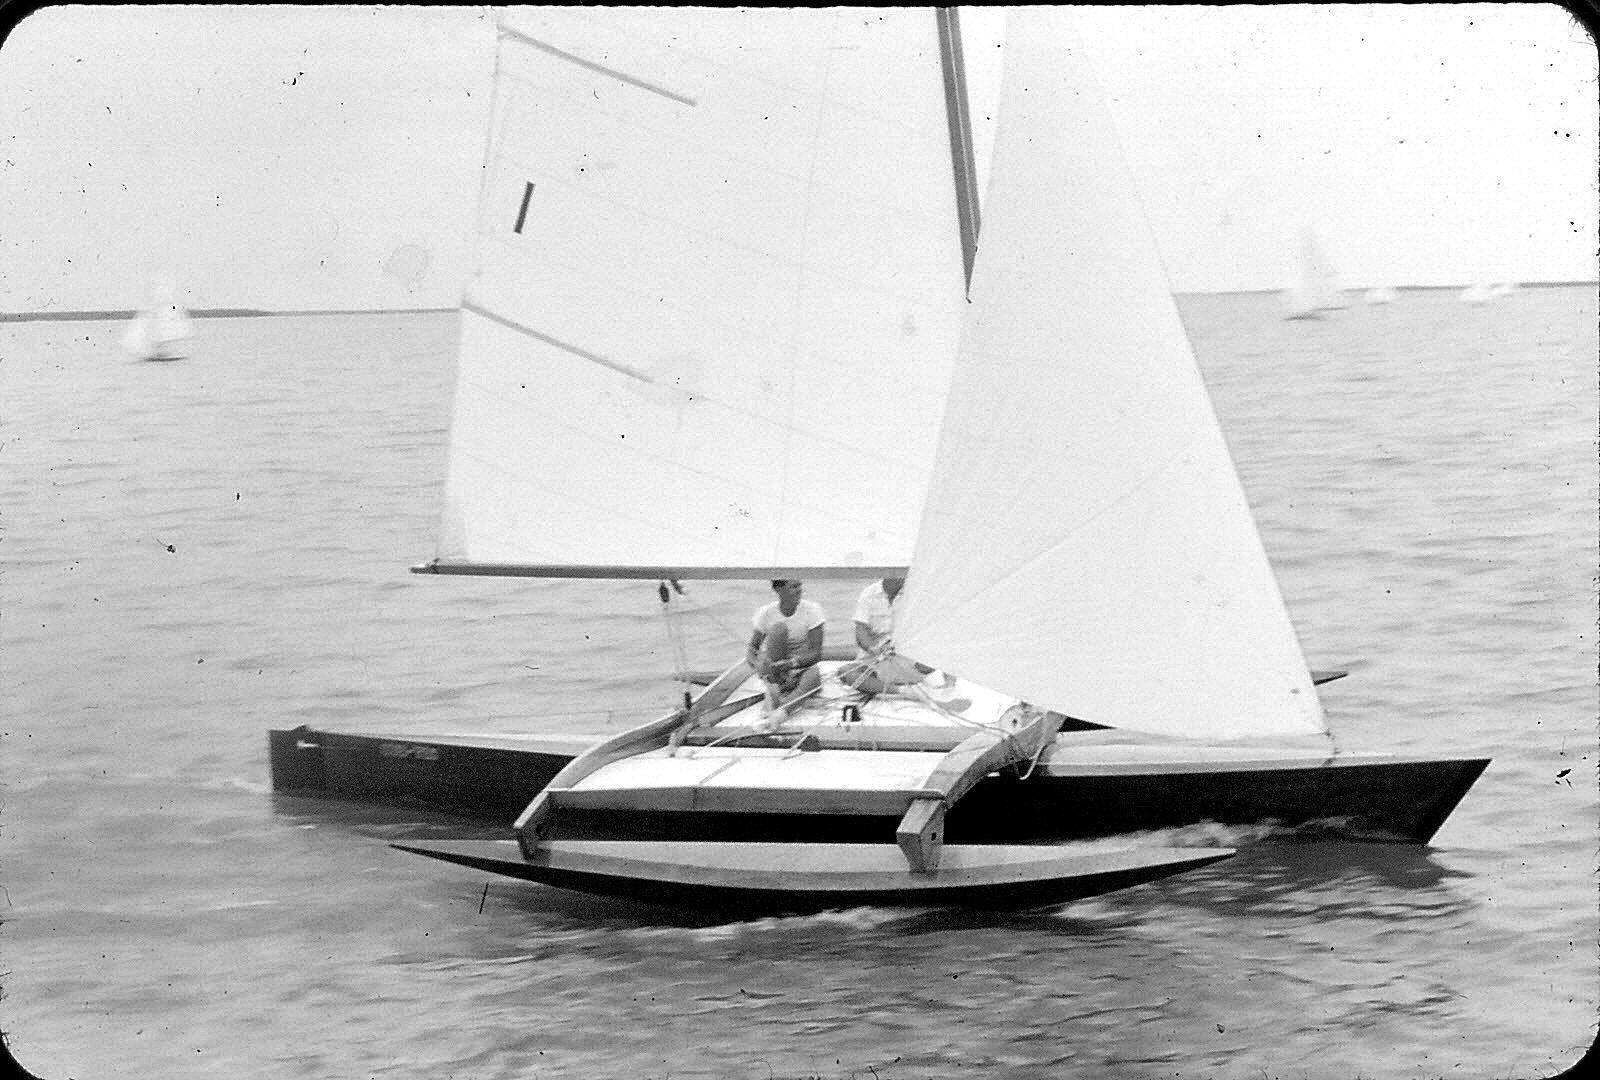 Gulfport_1959_0001c.jpg